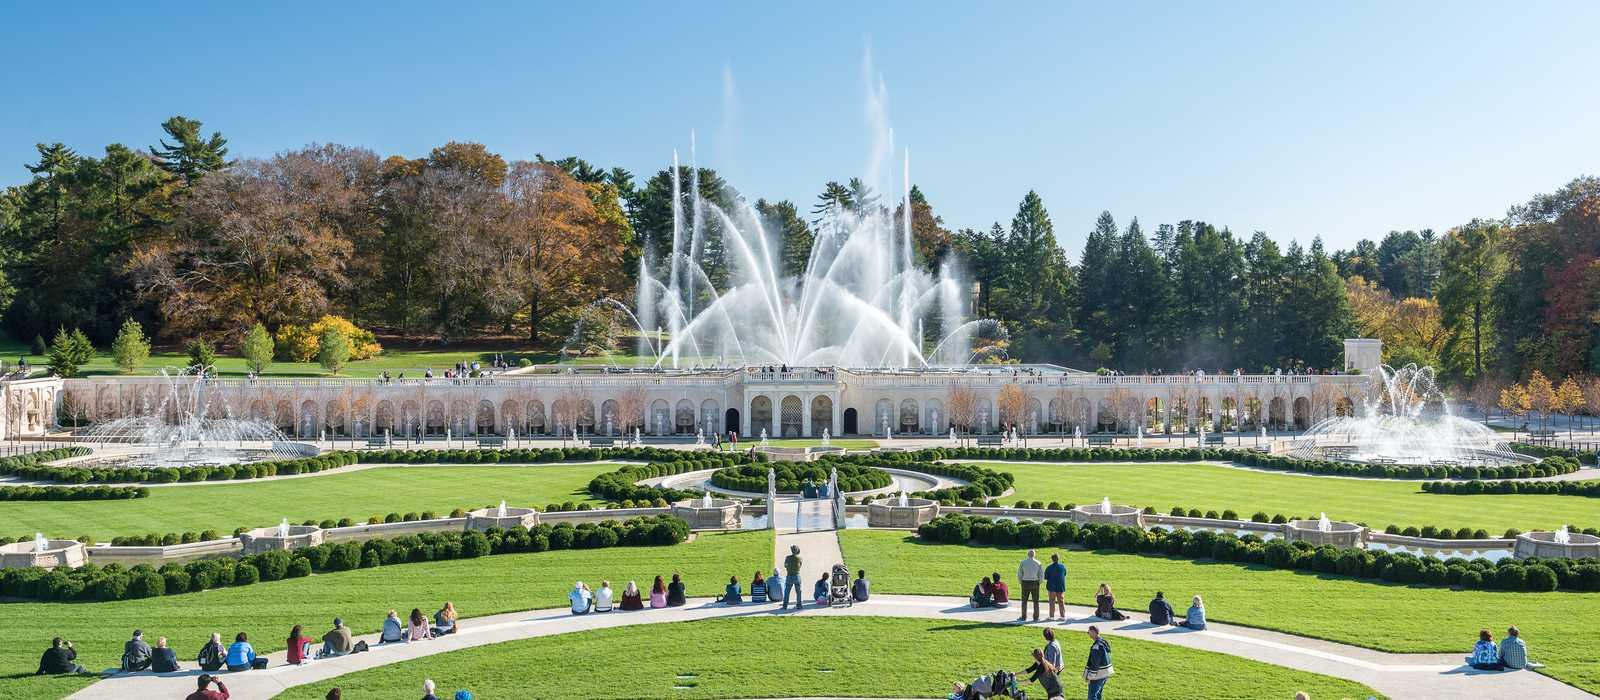 Der botanische Garten Longwood Gardens in Kennett Square, Pennsylvania